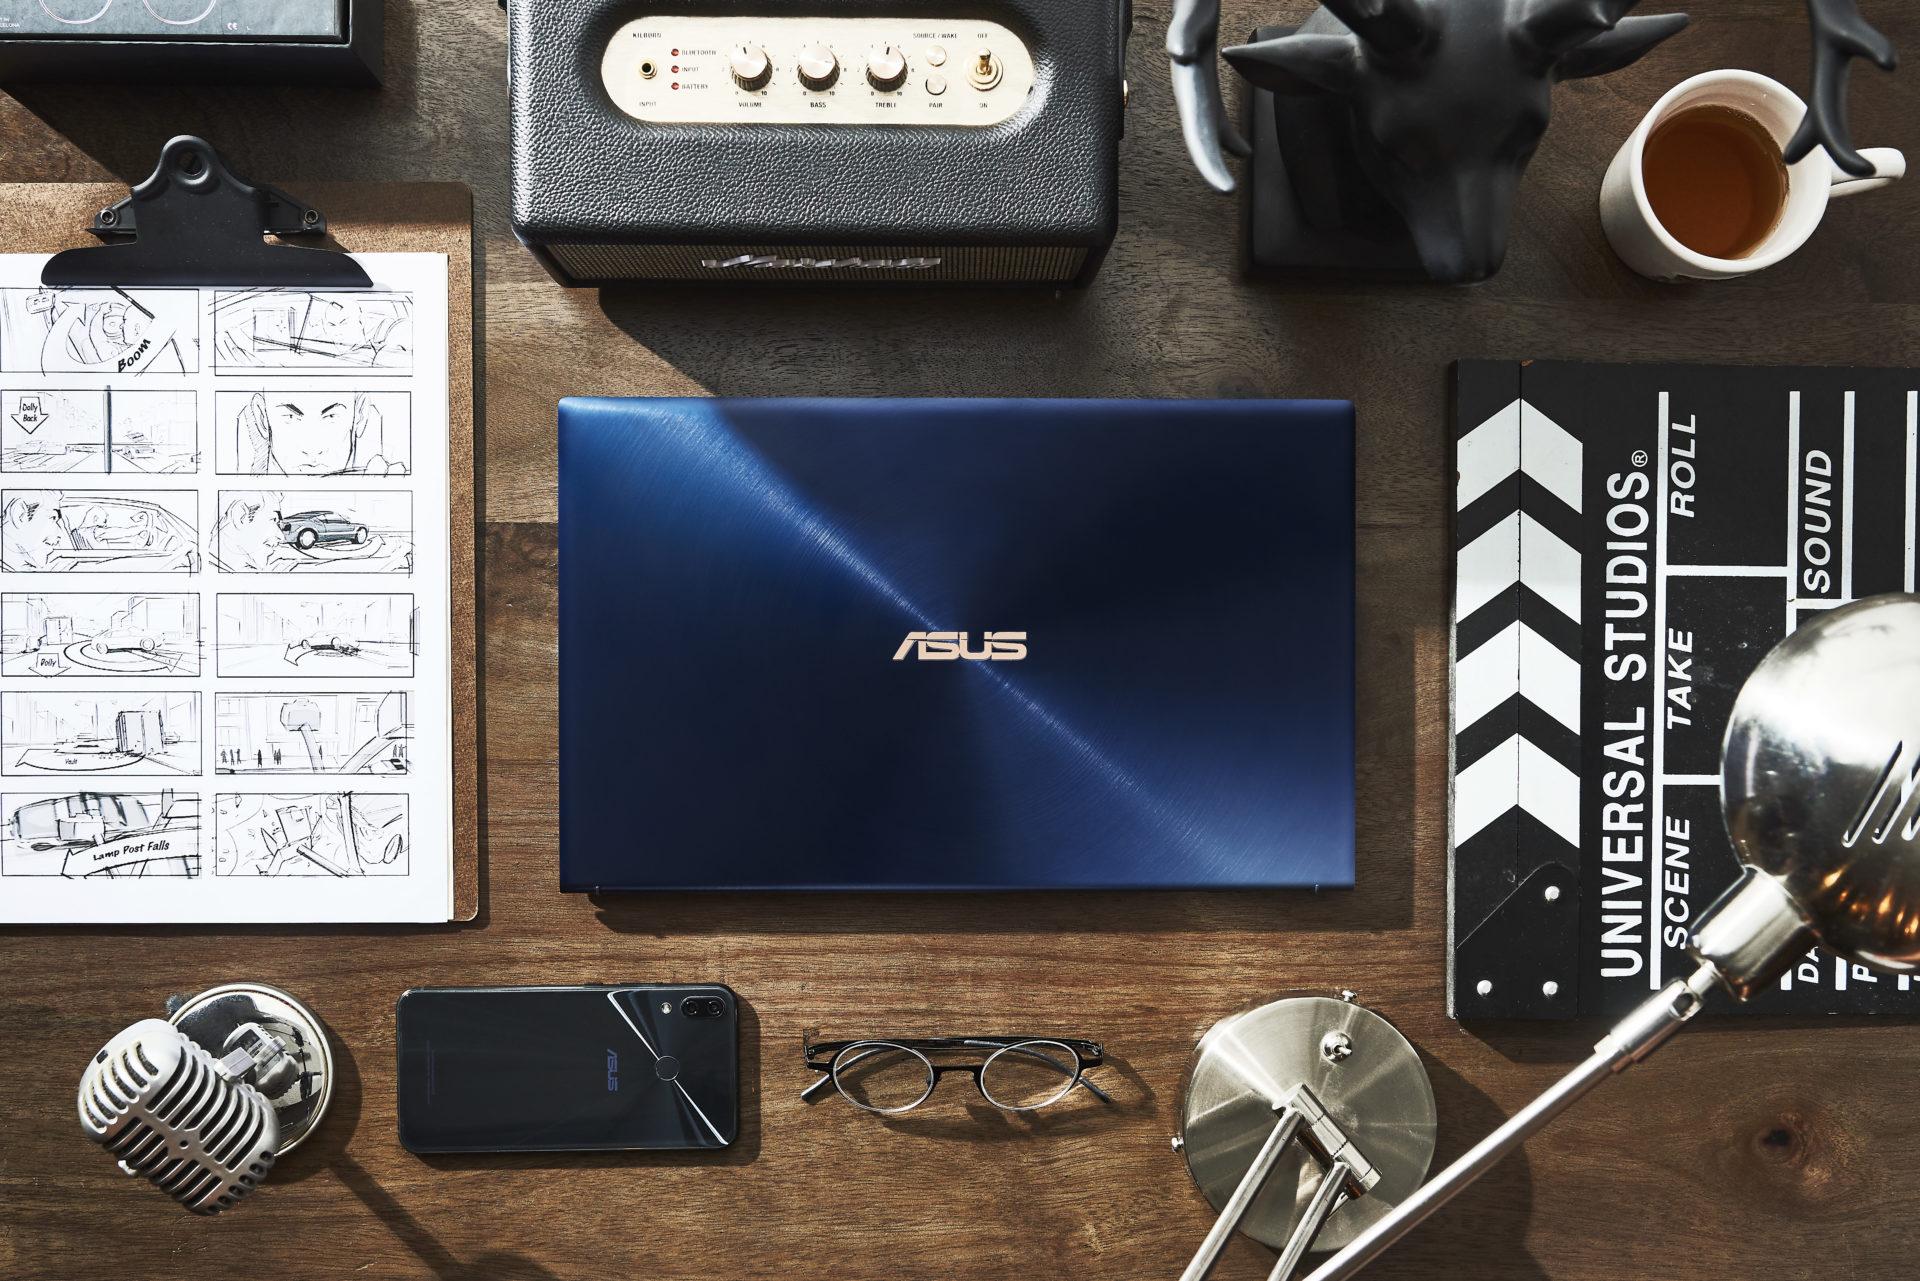 Asus ZenBook 14 notebook dalle tecnologie curiose